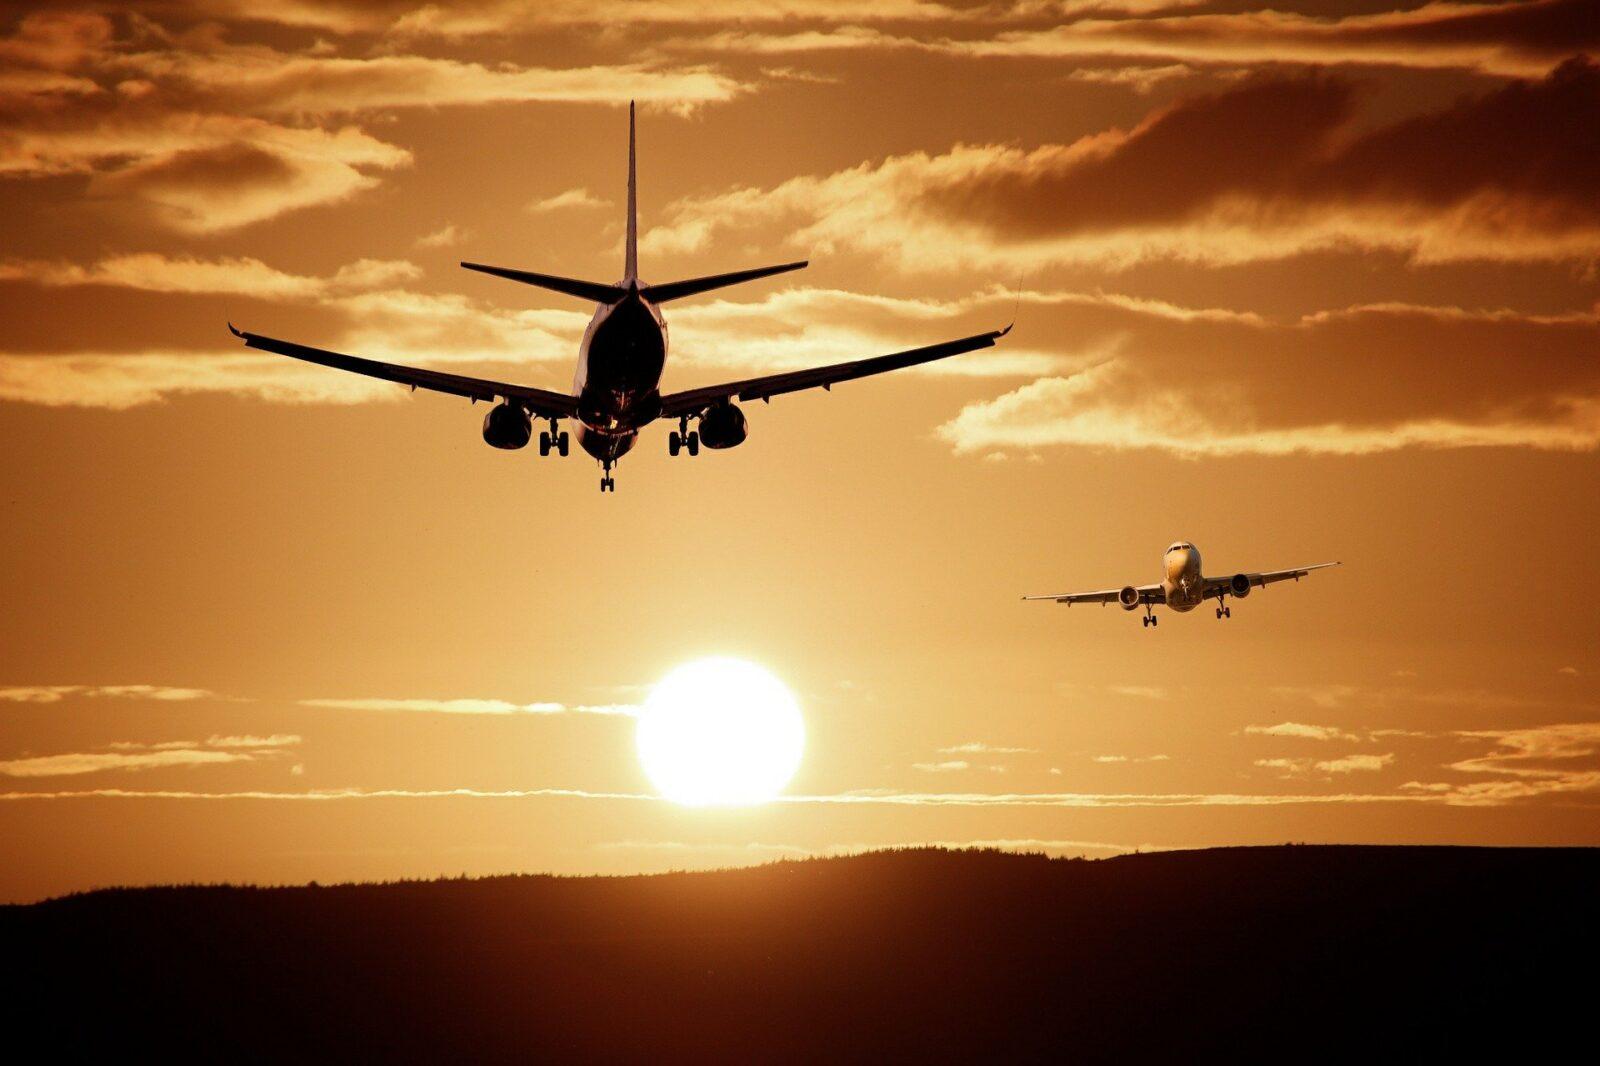 plane-513641_1920